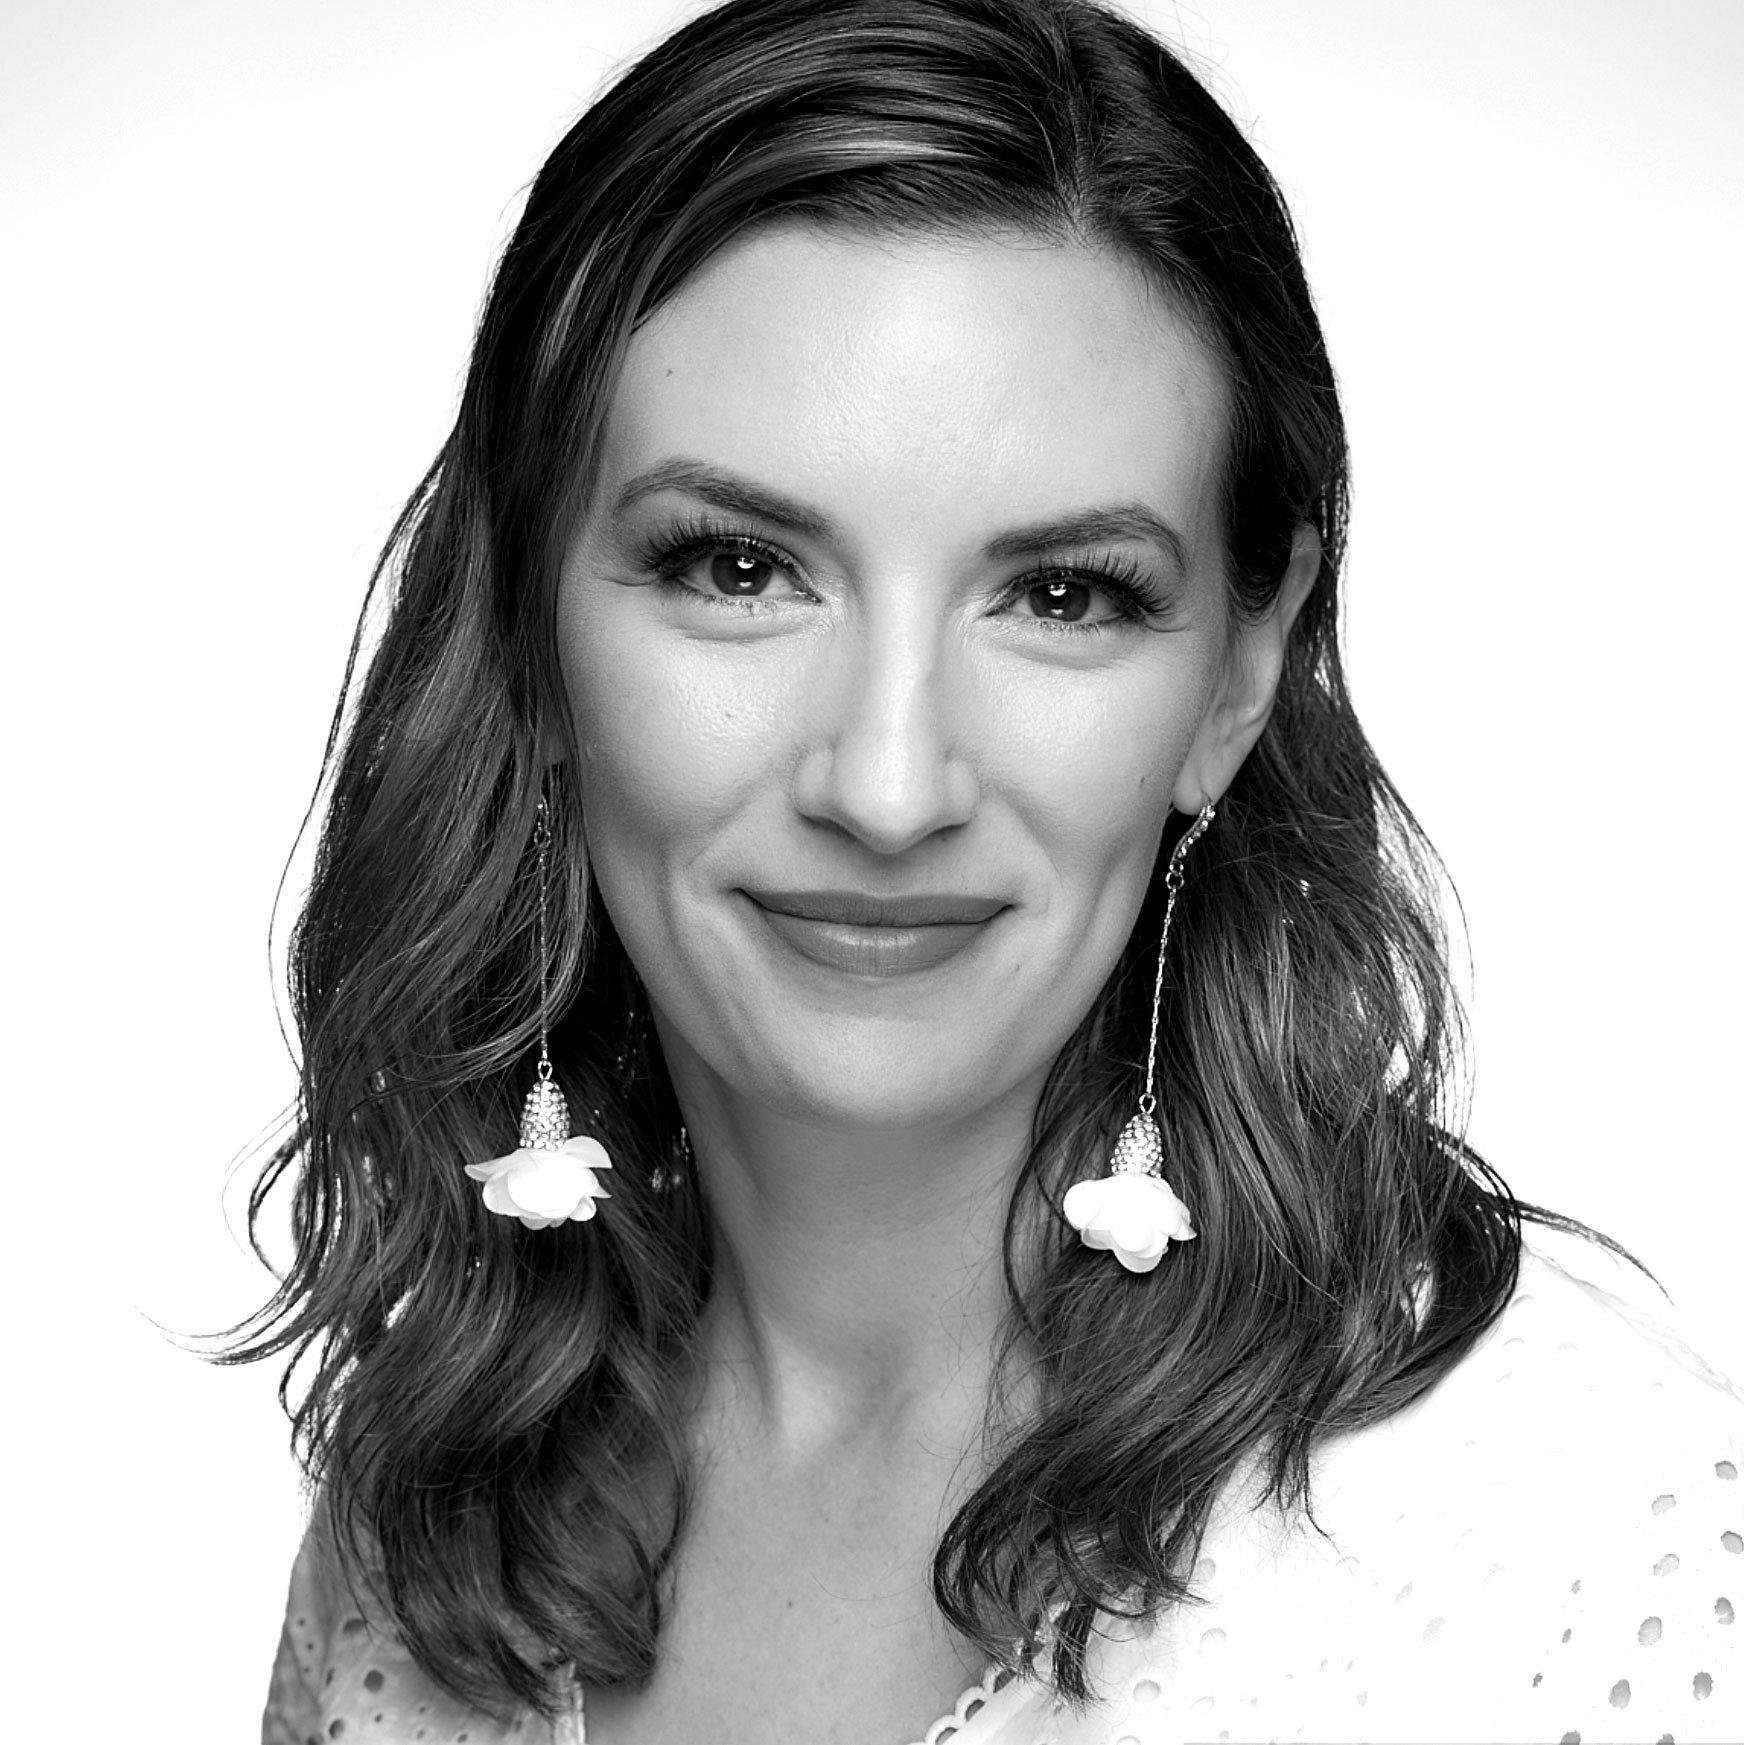 Black and white headshot of Inspired Studio President Maria Traino